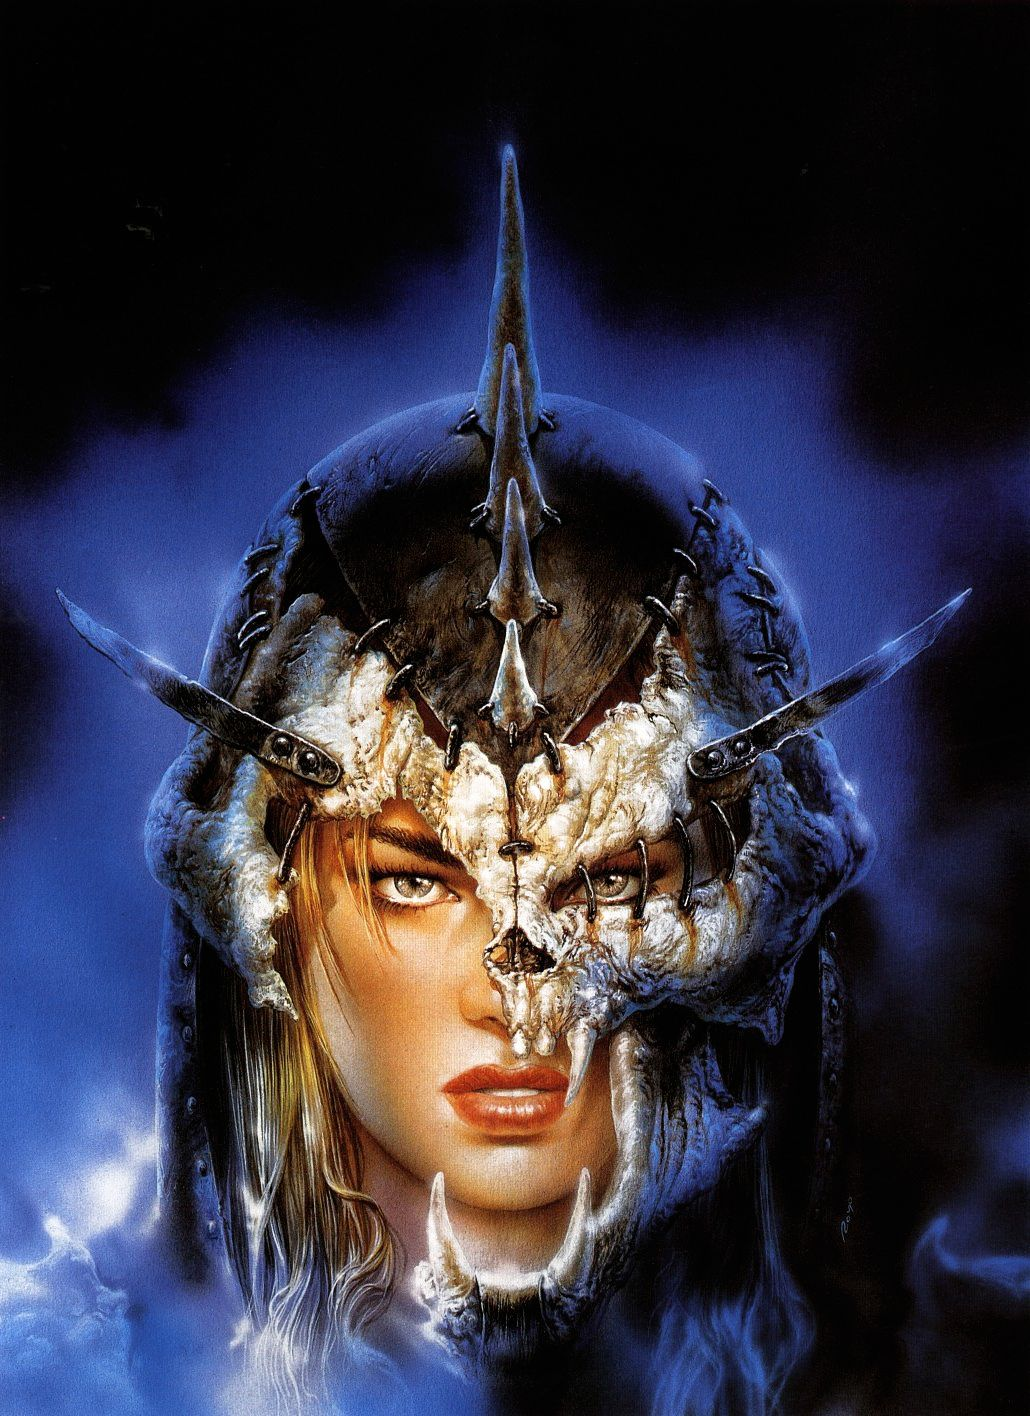 ArtStation - Space Princess, Salvador Trakal